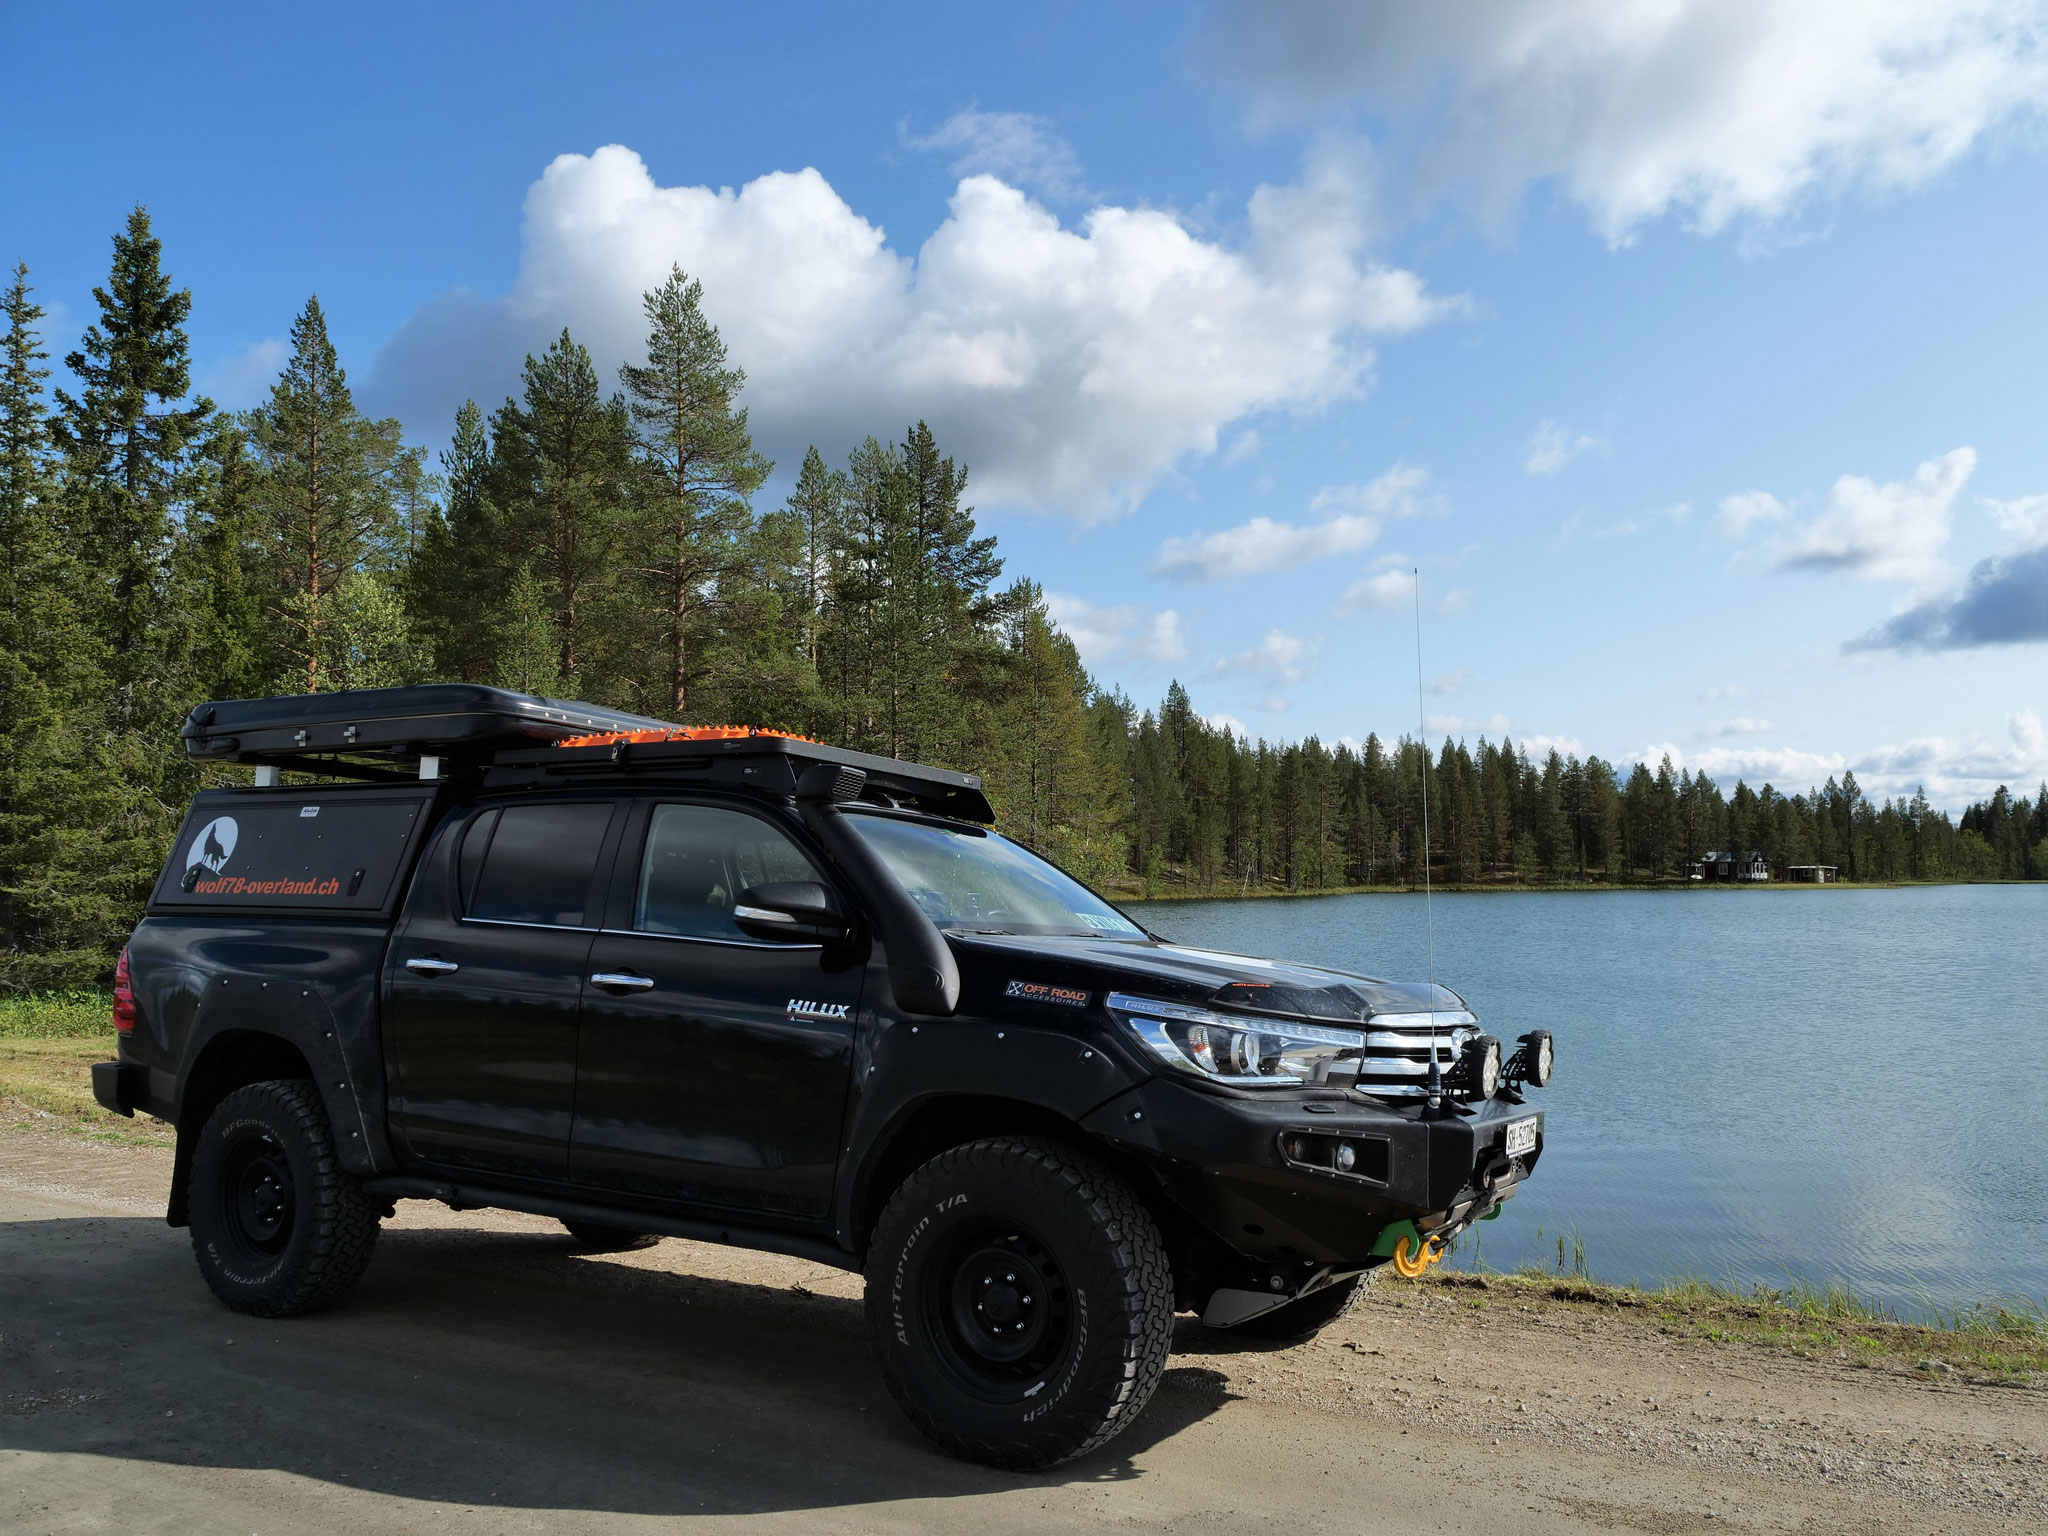 Toyota Hilux AFN Roof top tent Dachzelt Frontrunner Rocksliders TJM Snorkel Revo #ProjektBlackwolf 2016 2017 2.4 wolf78-overland.ch offroad 4x4 Rival James Baroud BFGoodrich 32 inc tires wolf78 ARB Alu-cab